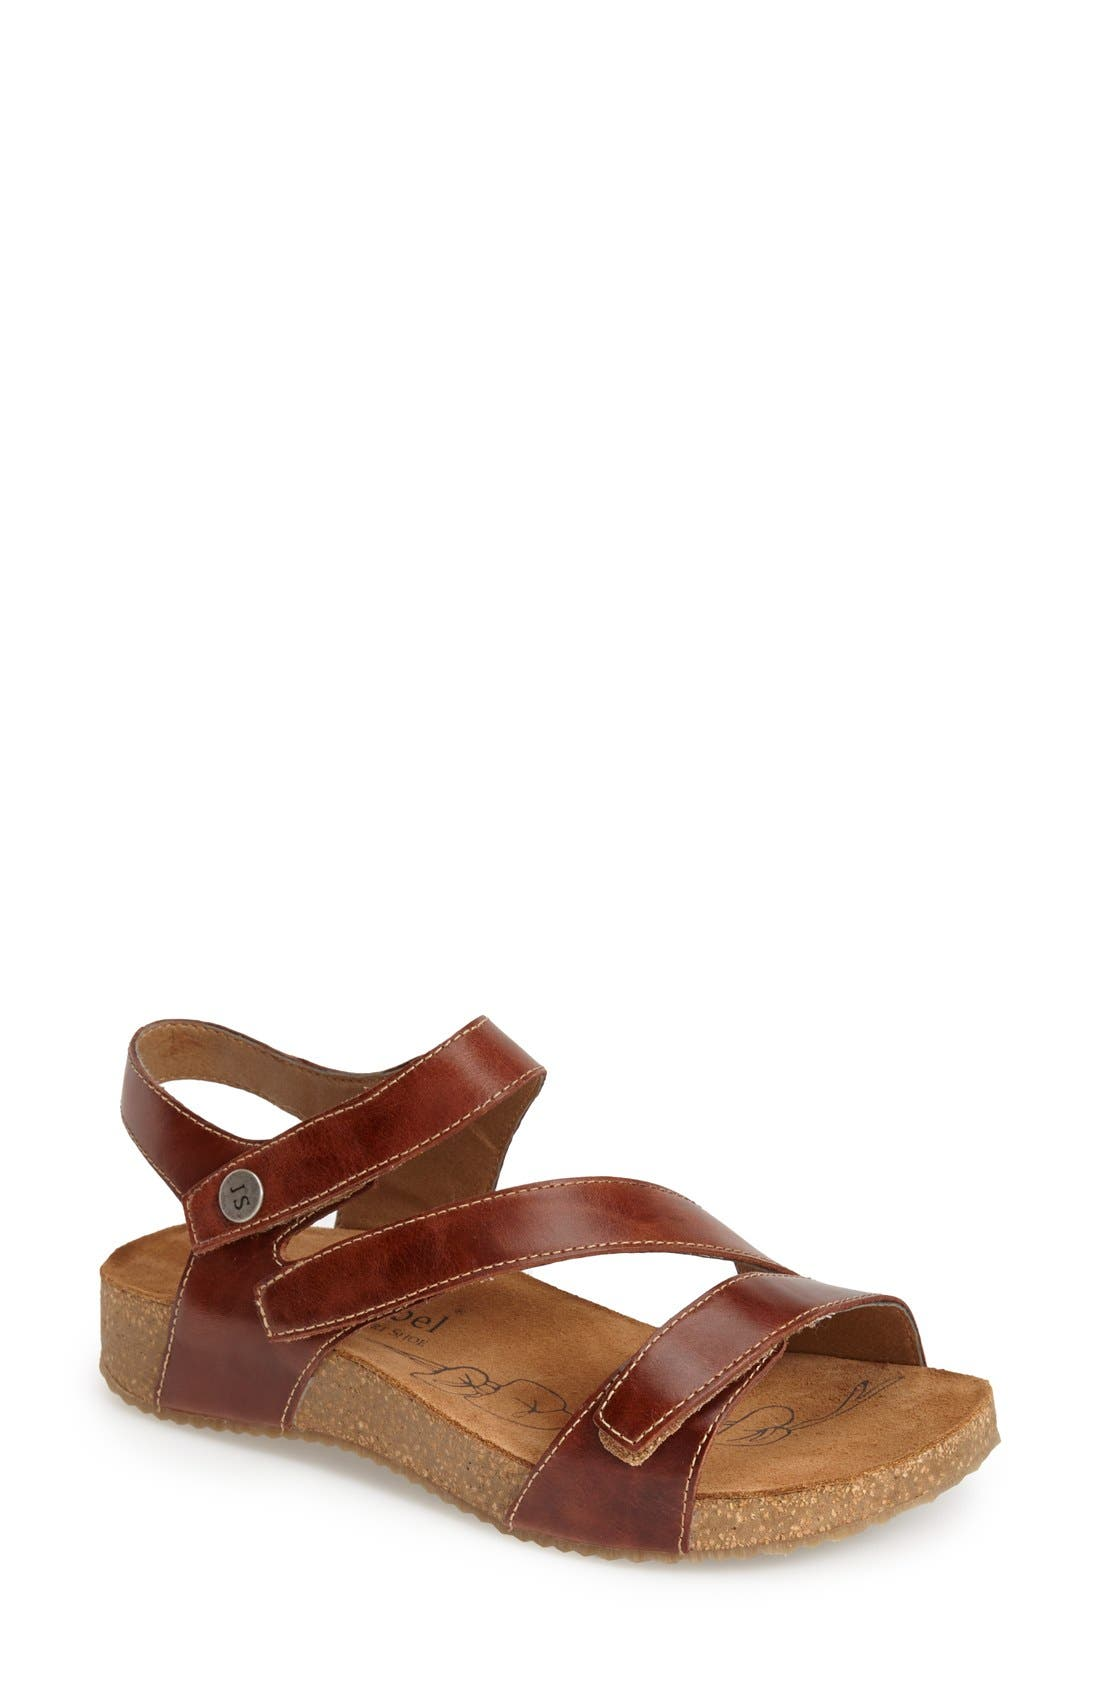 Main Image - Josef Seibel 'Tonga' Leather Sandal (Women)